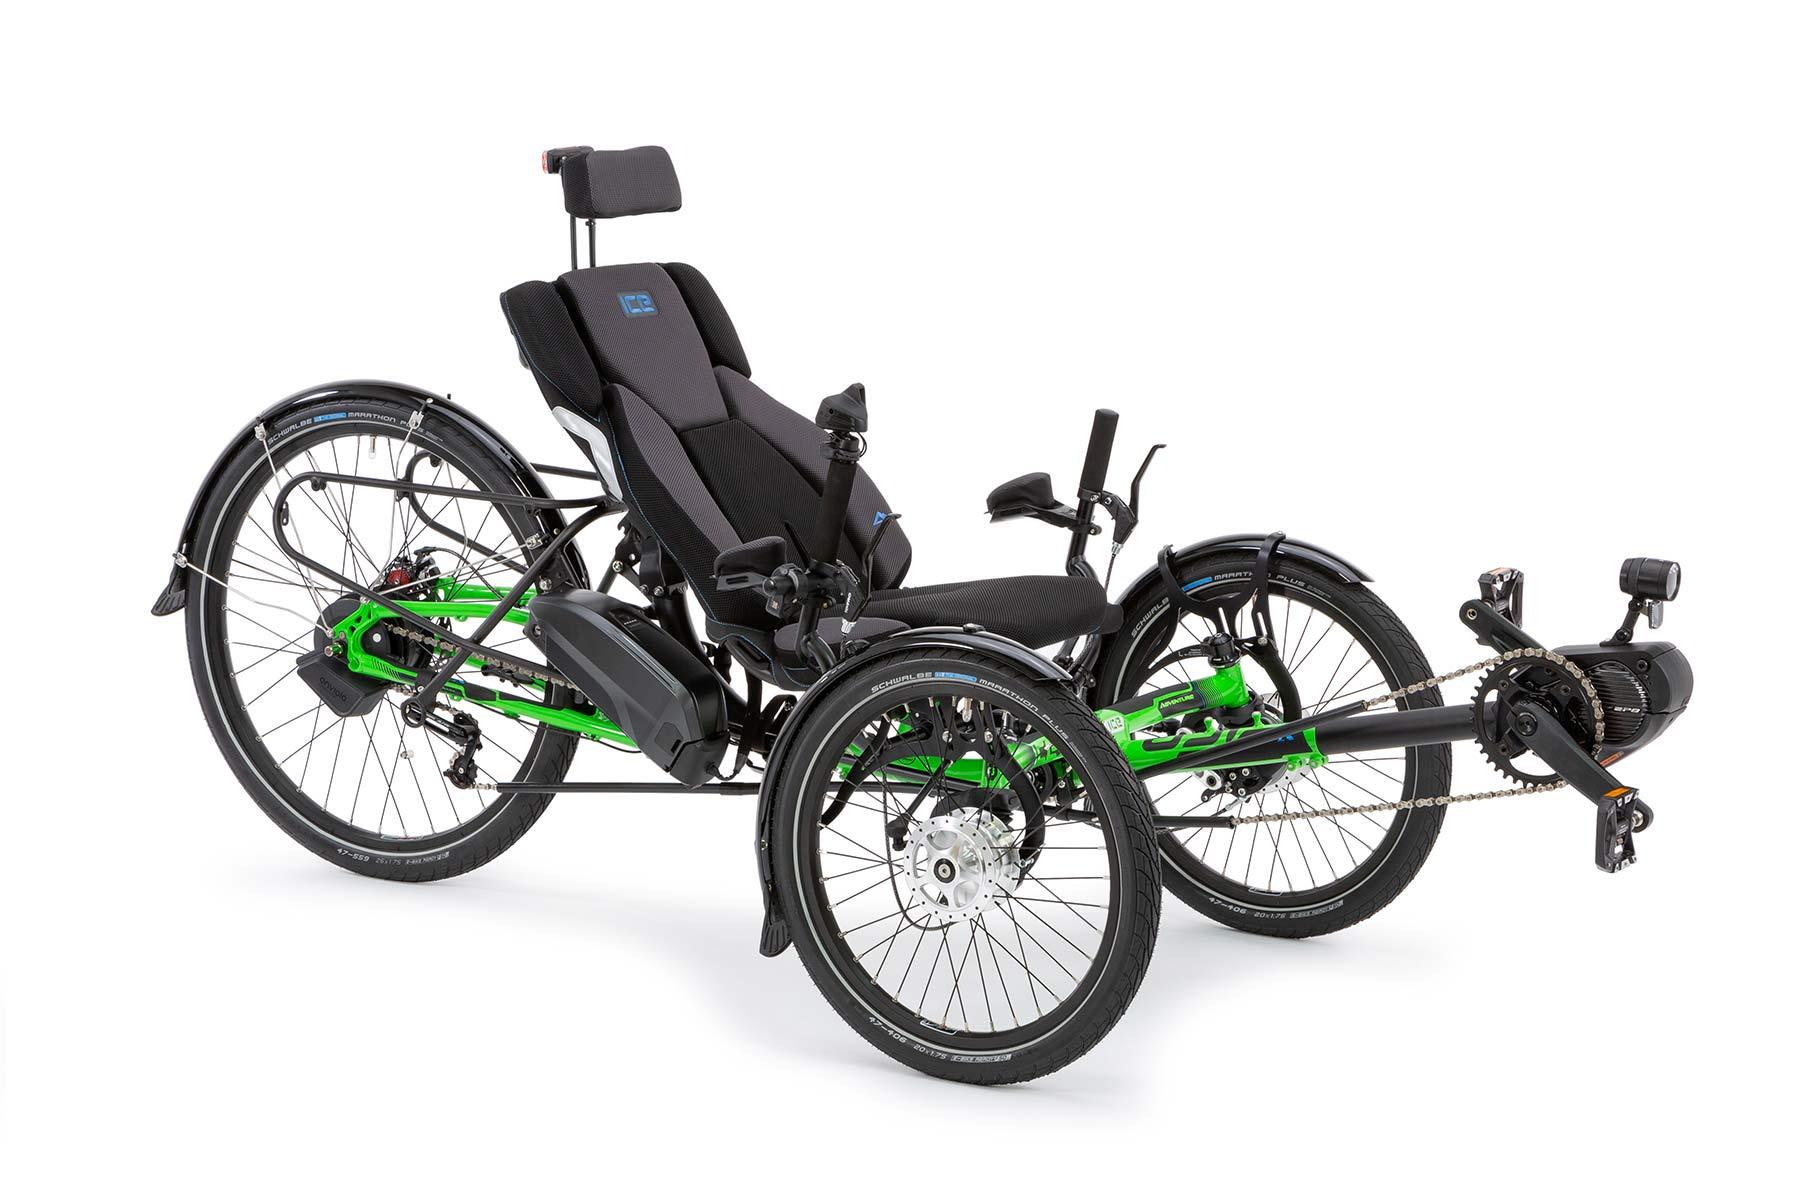 ICE Electric Trike - Shimano STEPs E6100 and E8000 Electric